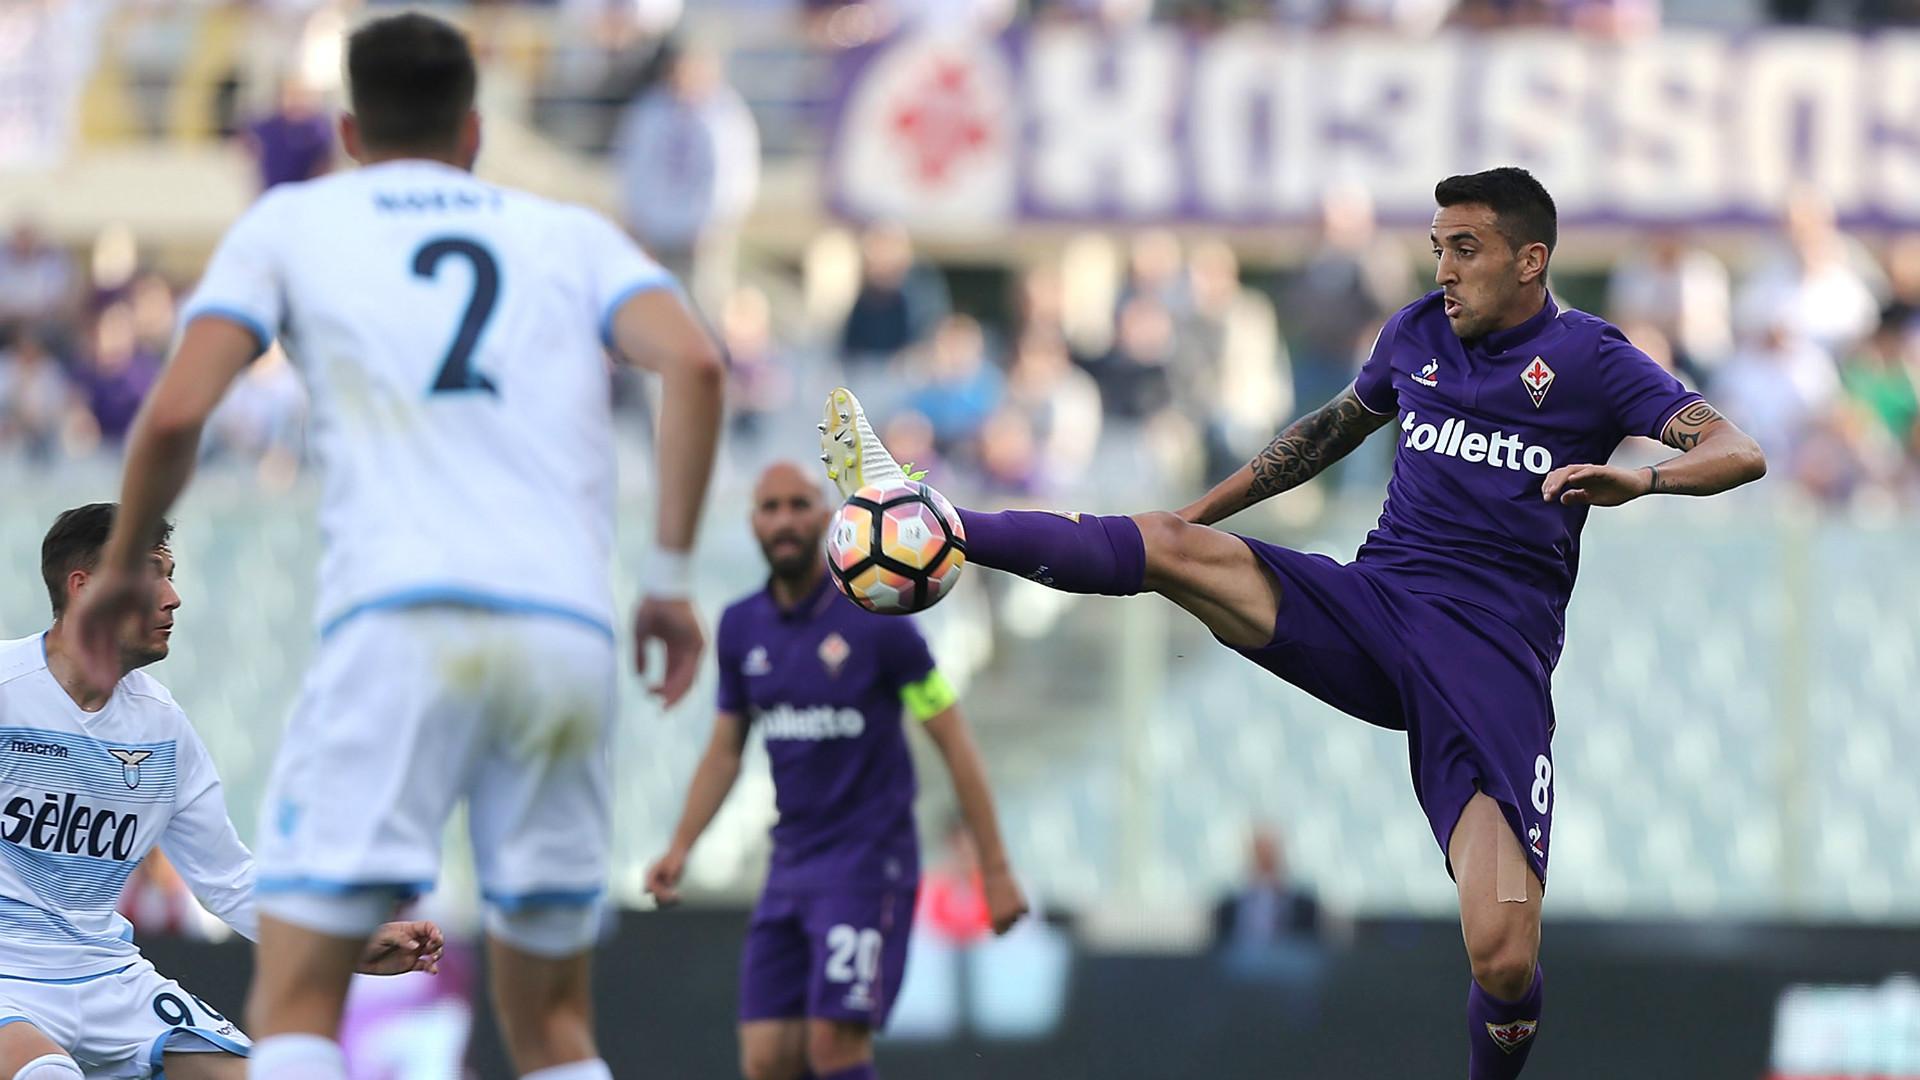 Matias Vecino Fiorentina Lazio Serie A